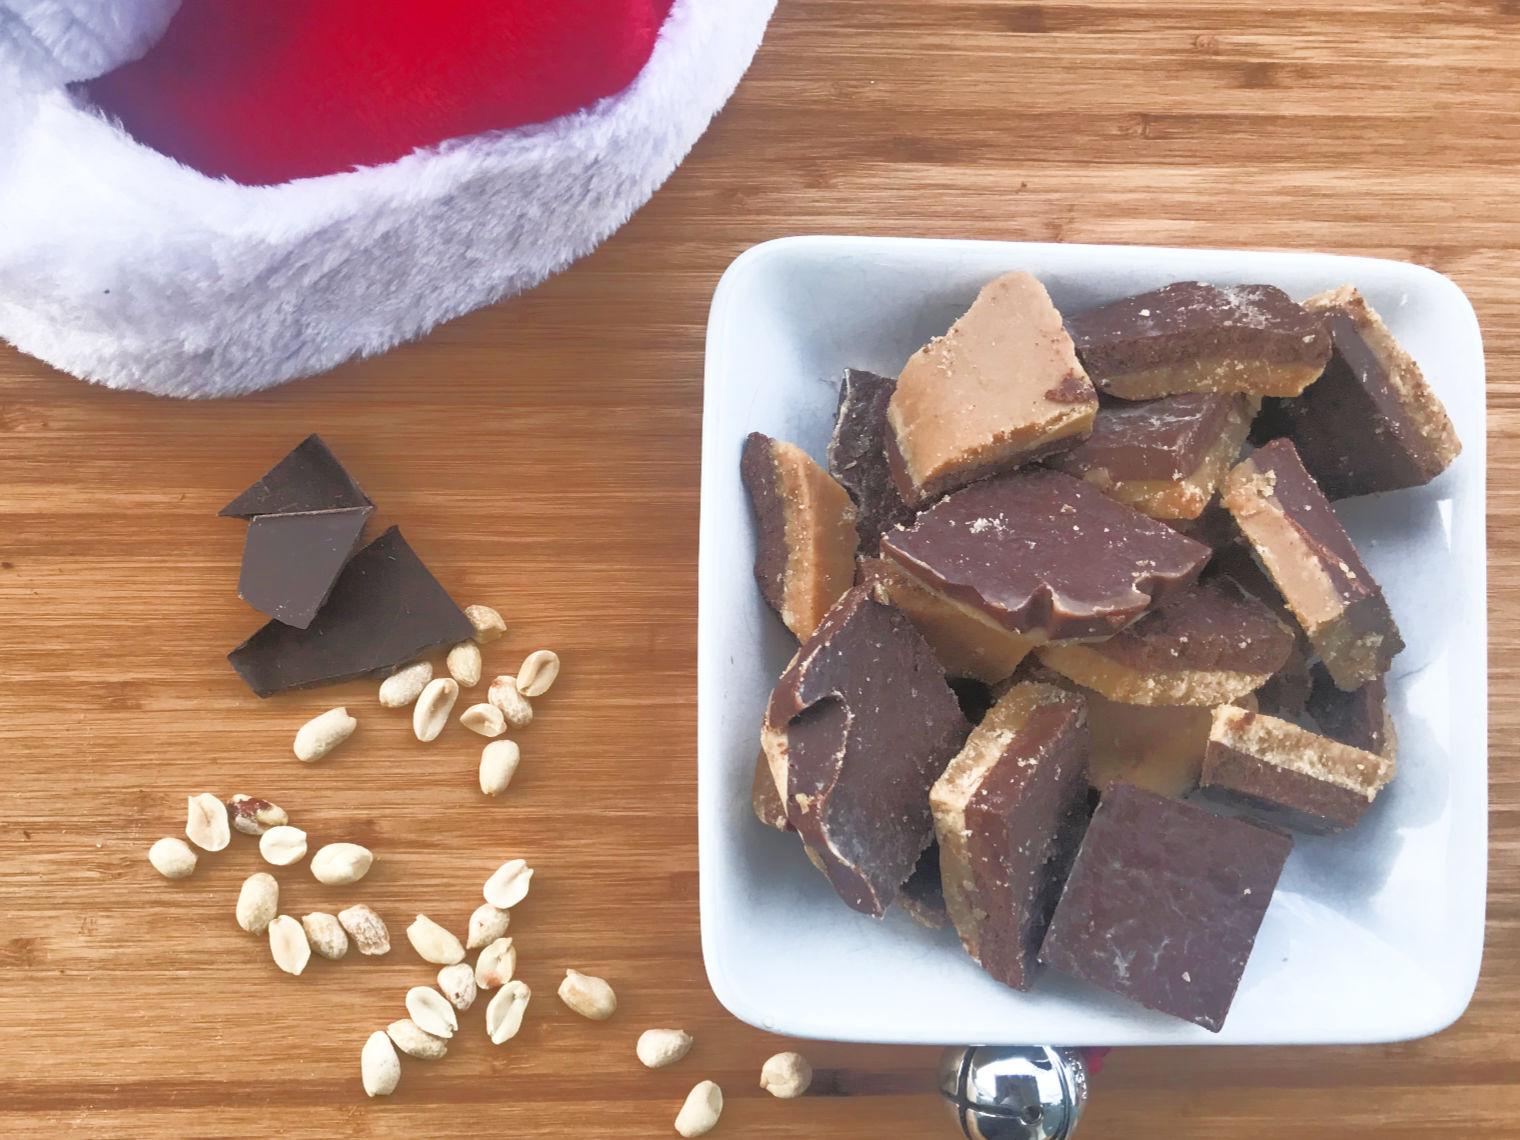 Keto Chocolate Peanut Butter Fudge